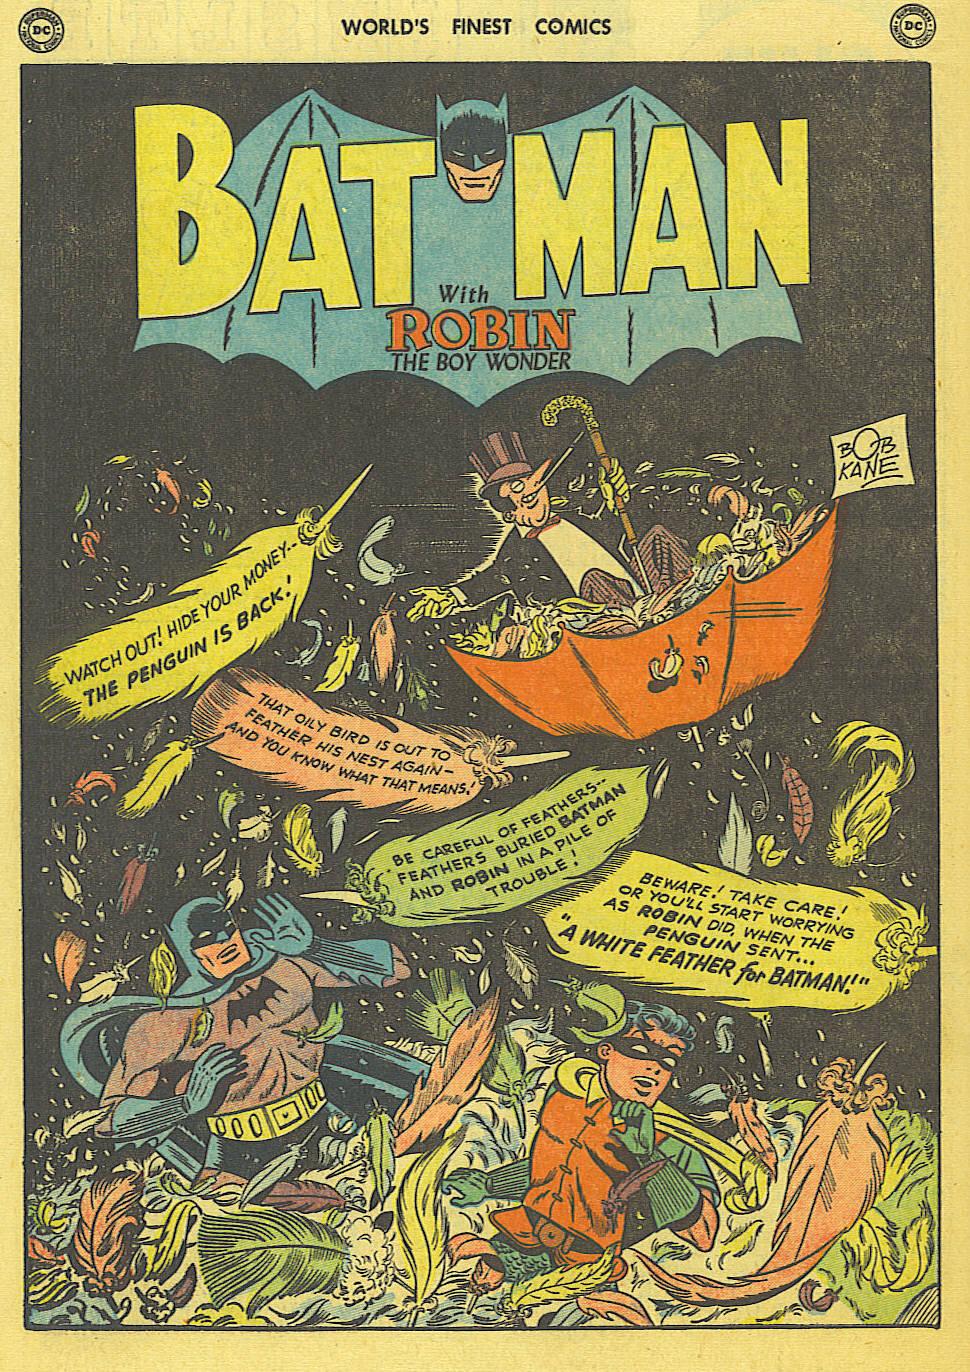 Read online World's Finest Comics comic -  Issue #49 - 63